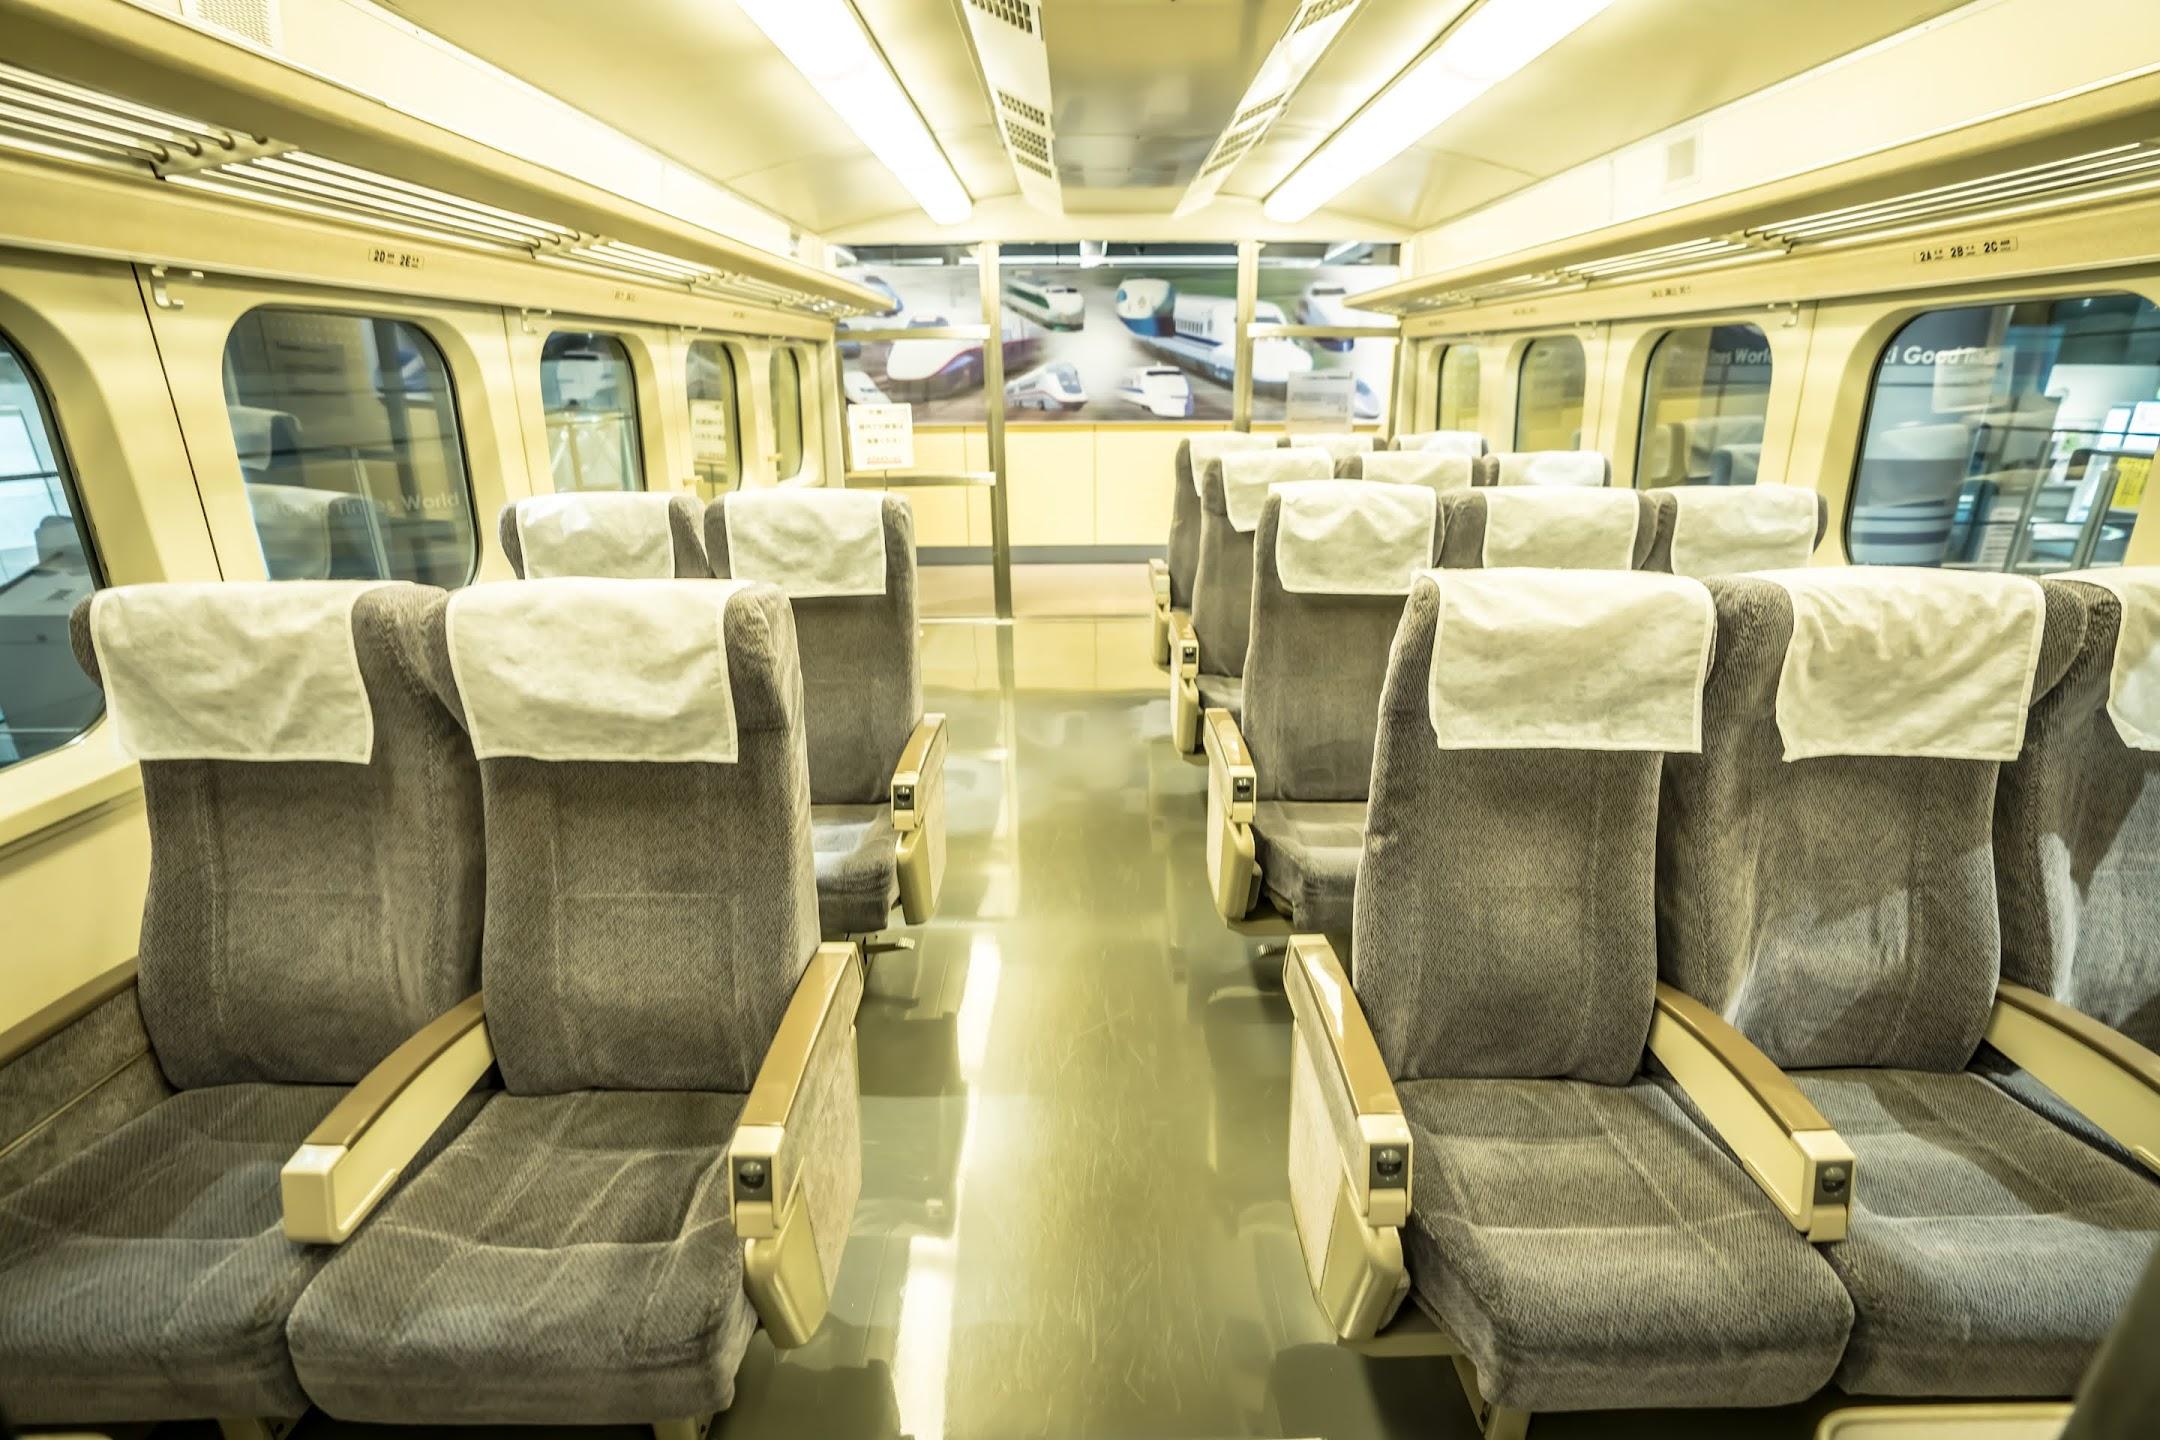 Kobe Meriken Park Kawasaki Good Times World shinkansen bullet train2